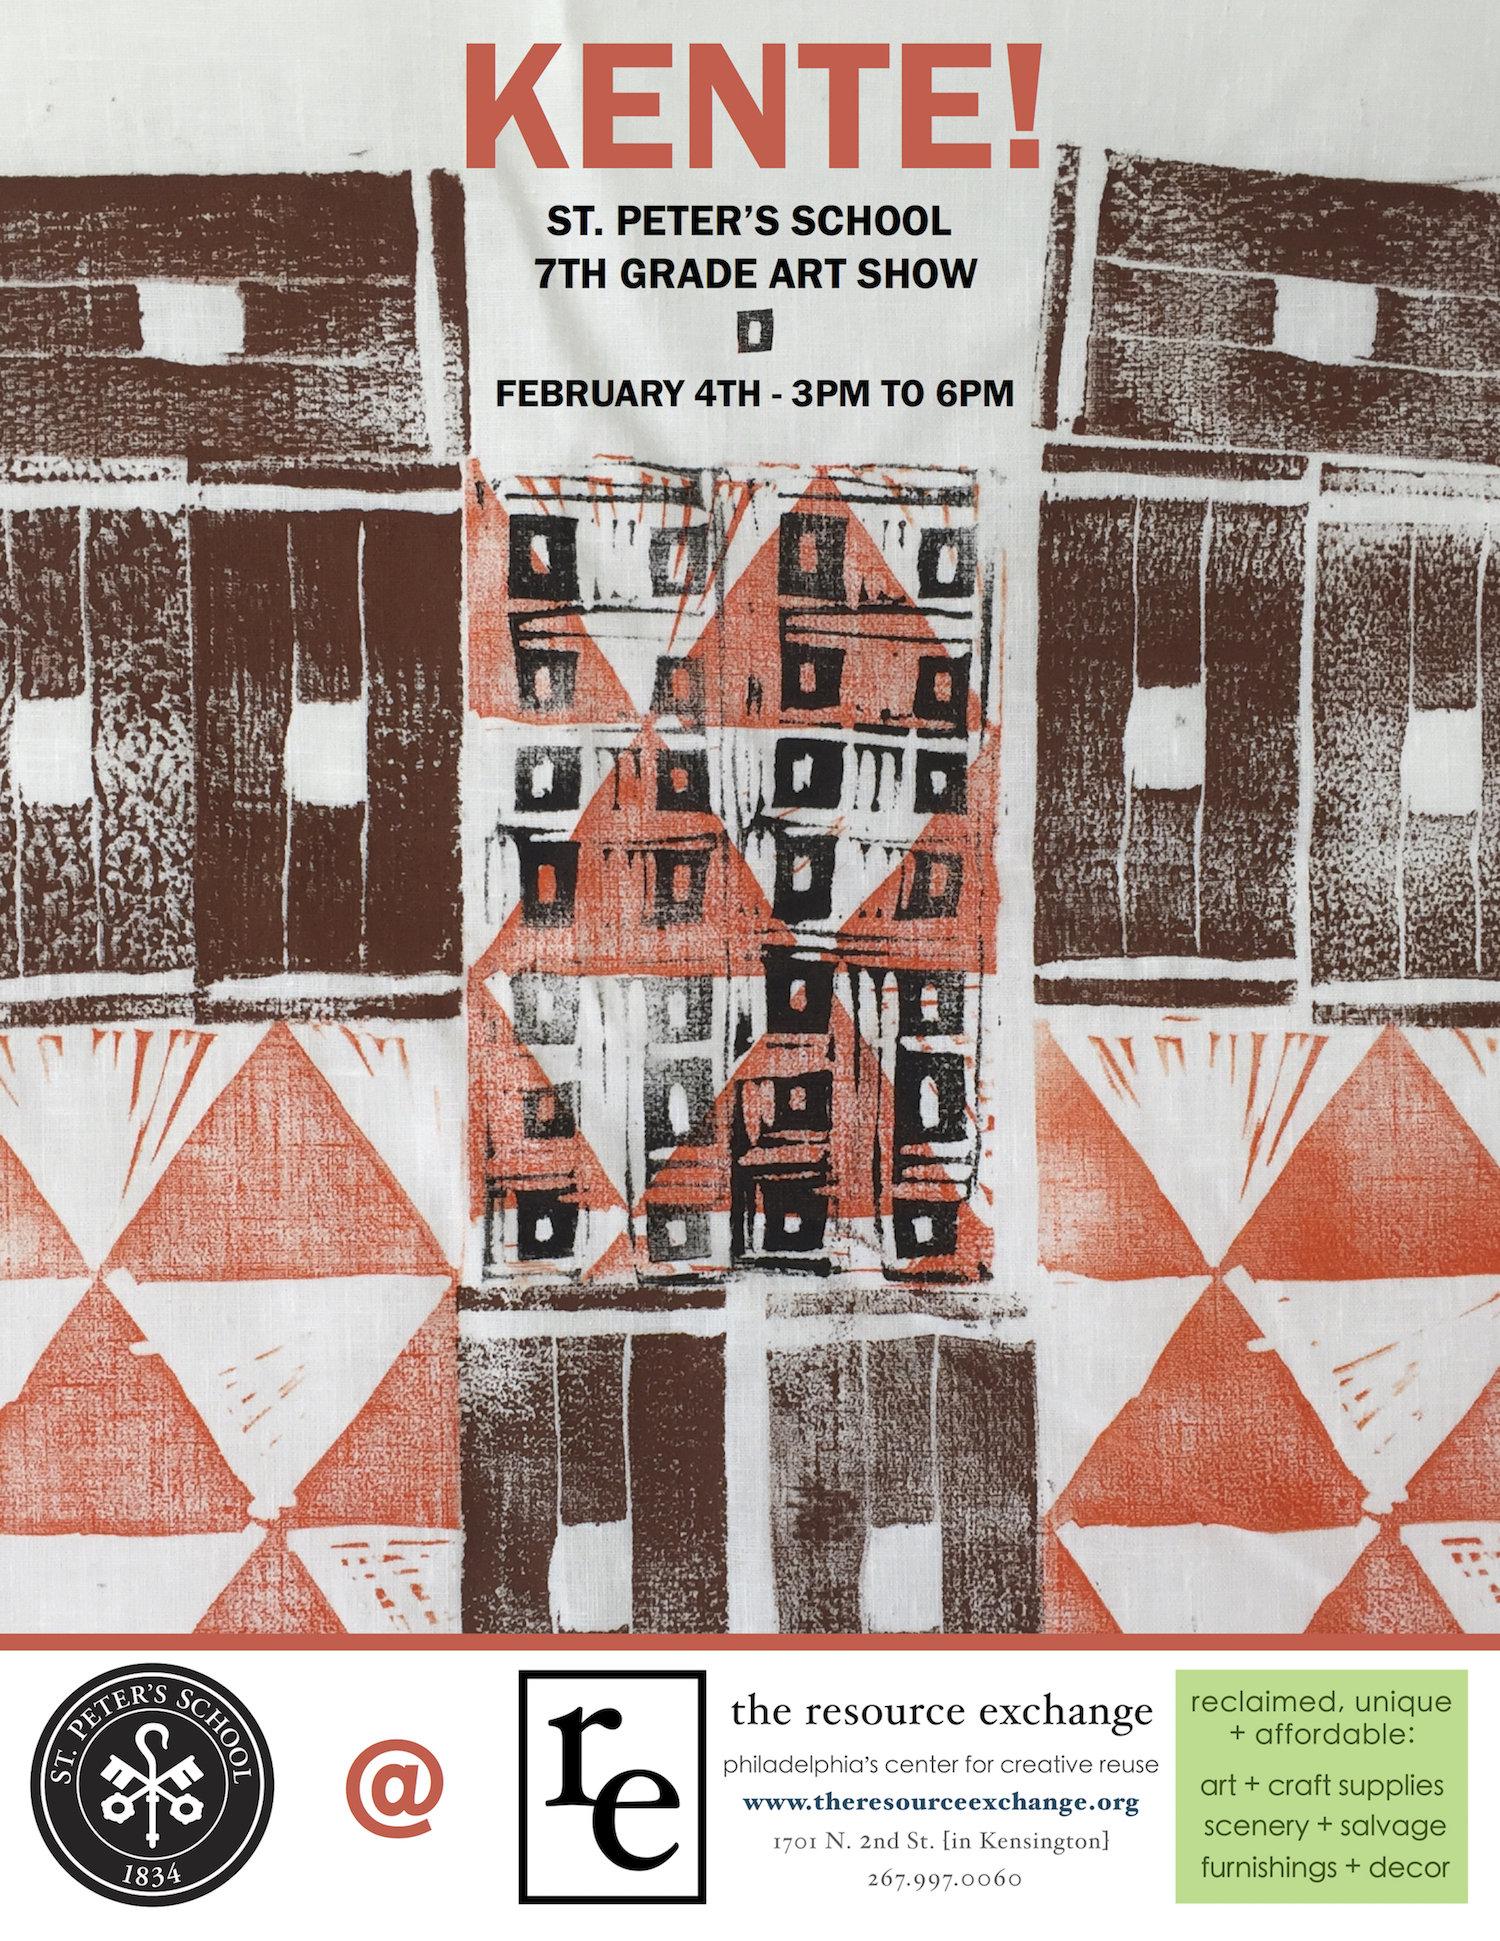 KENTE! Art Reception on Saturday, Feb 4th 3-6pm